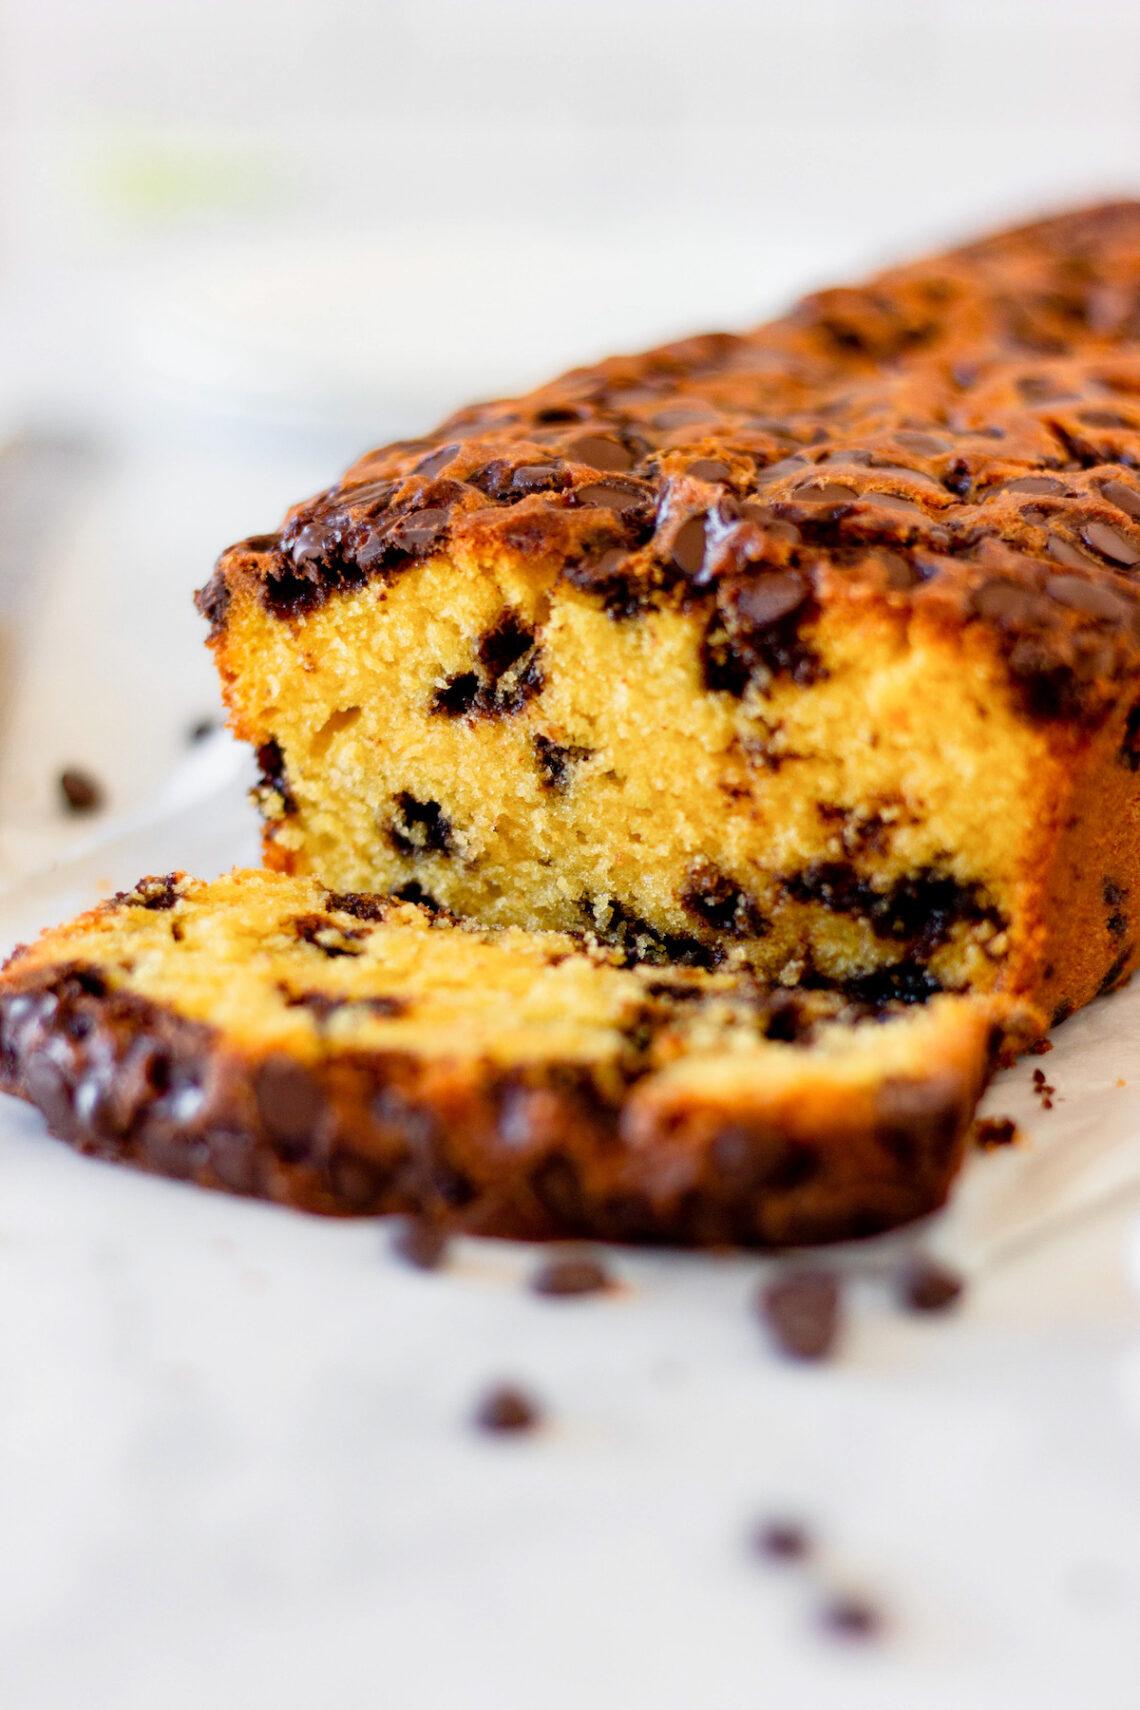 slice of pumpkin chocolate chip bread